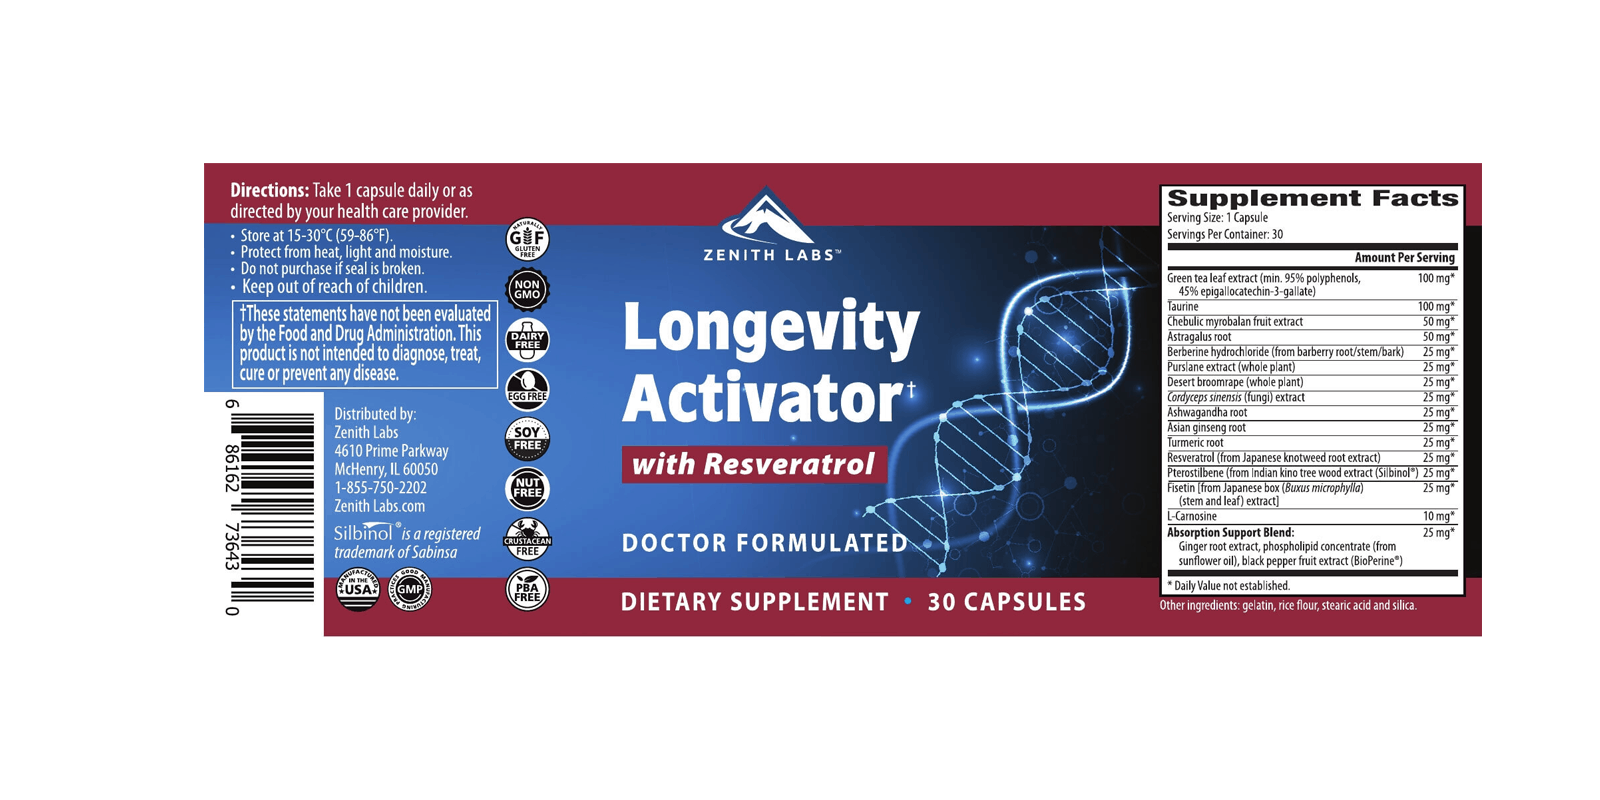 Longevity Activator dosage